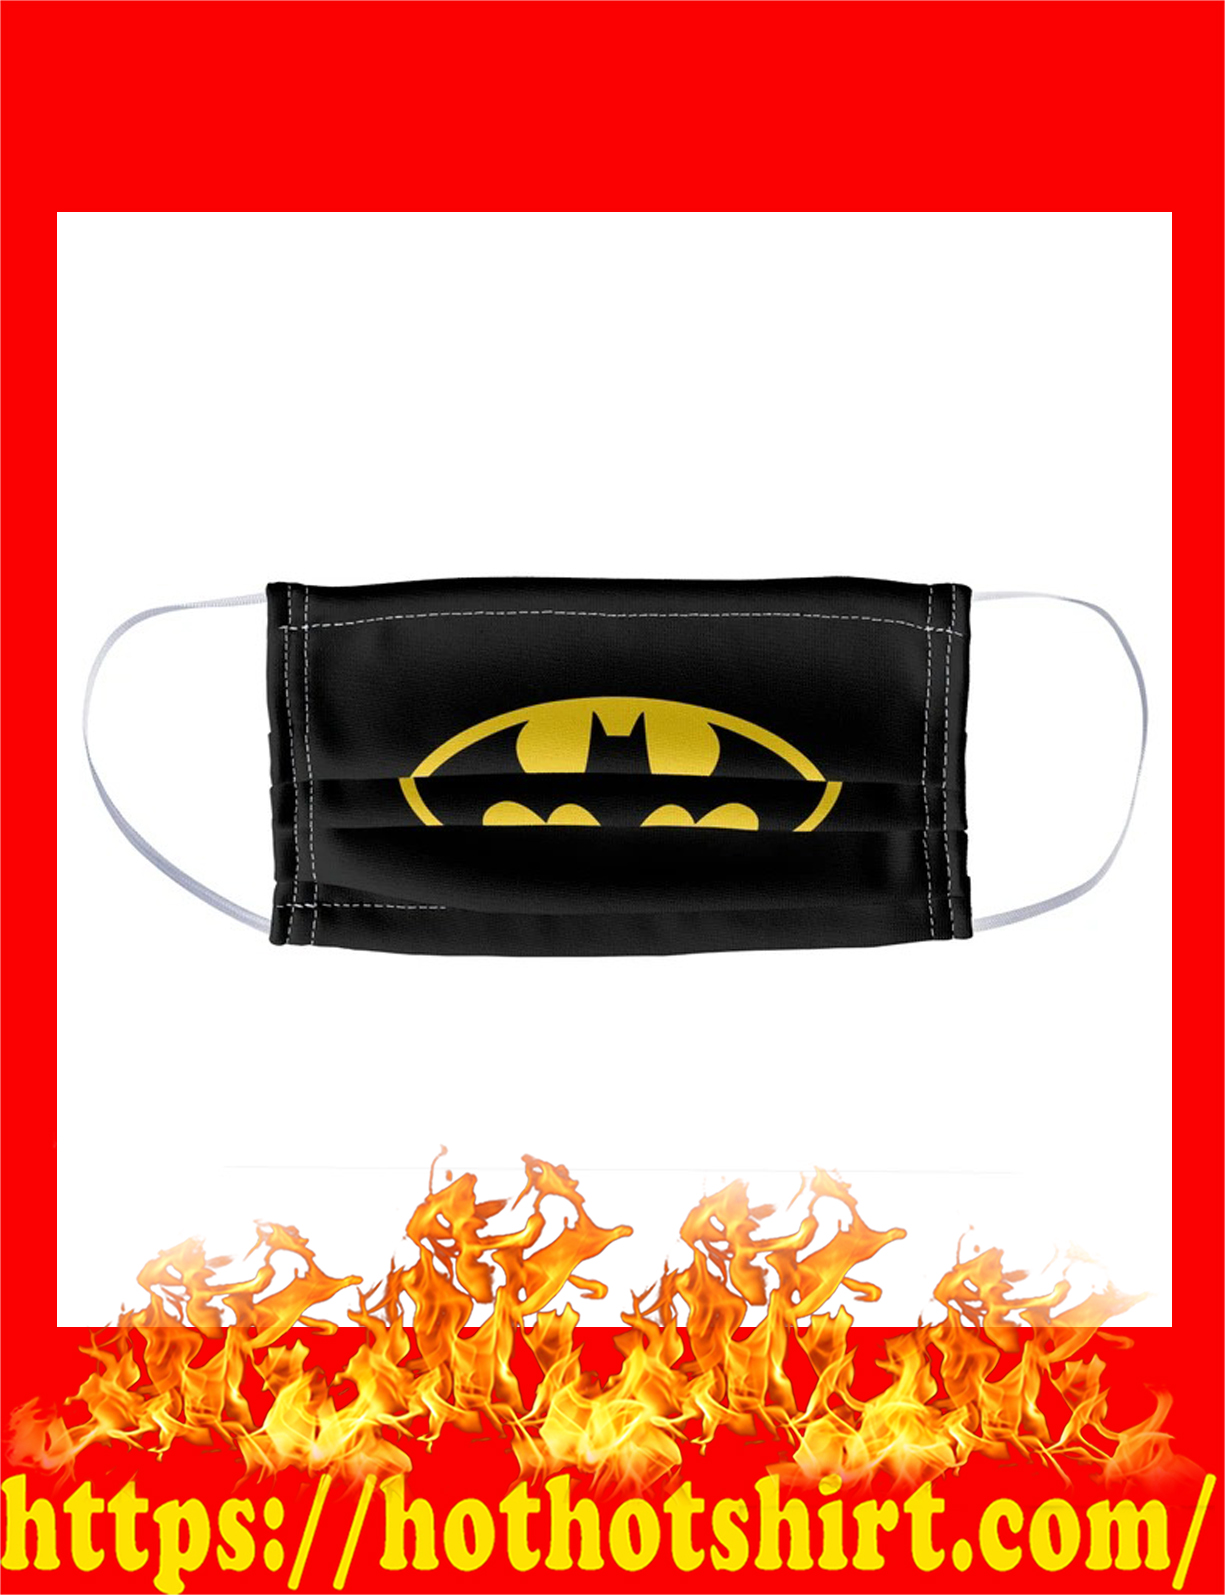 Batman bat shield logo face mask - detail